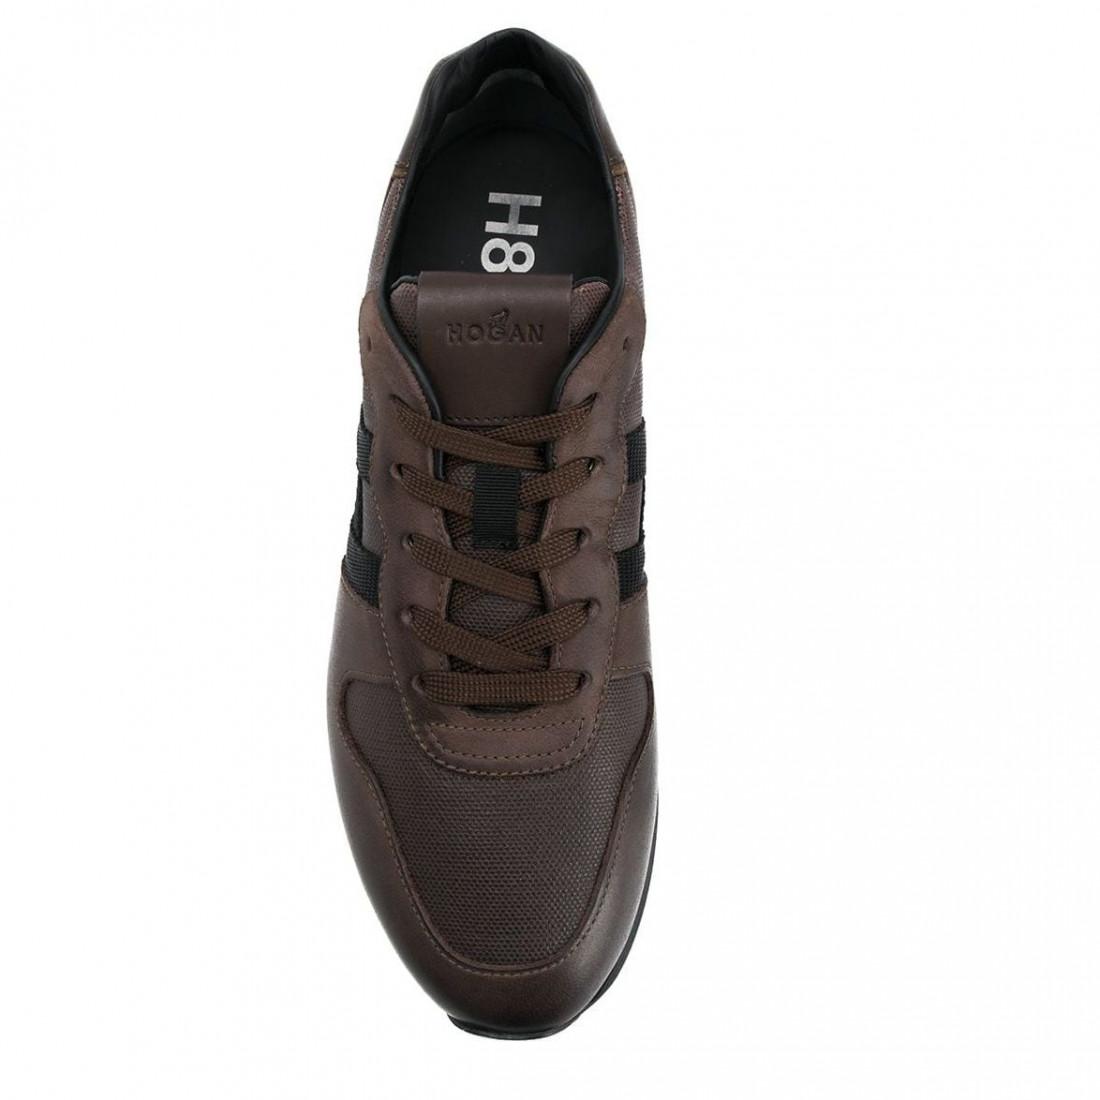 Men's Hogan H383 sneaker in brown leather